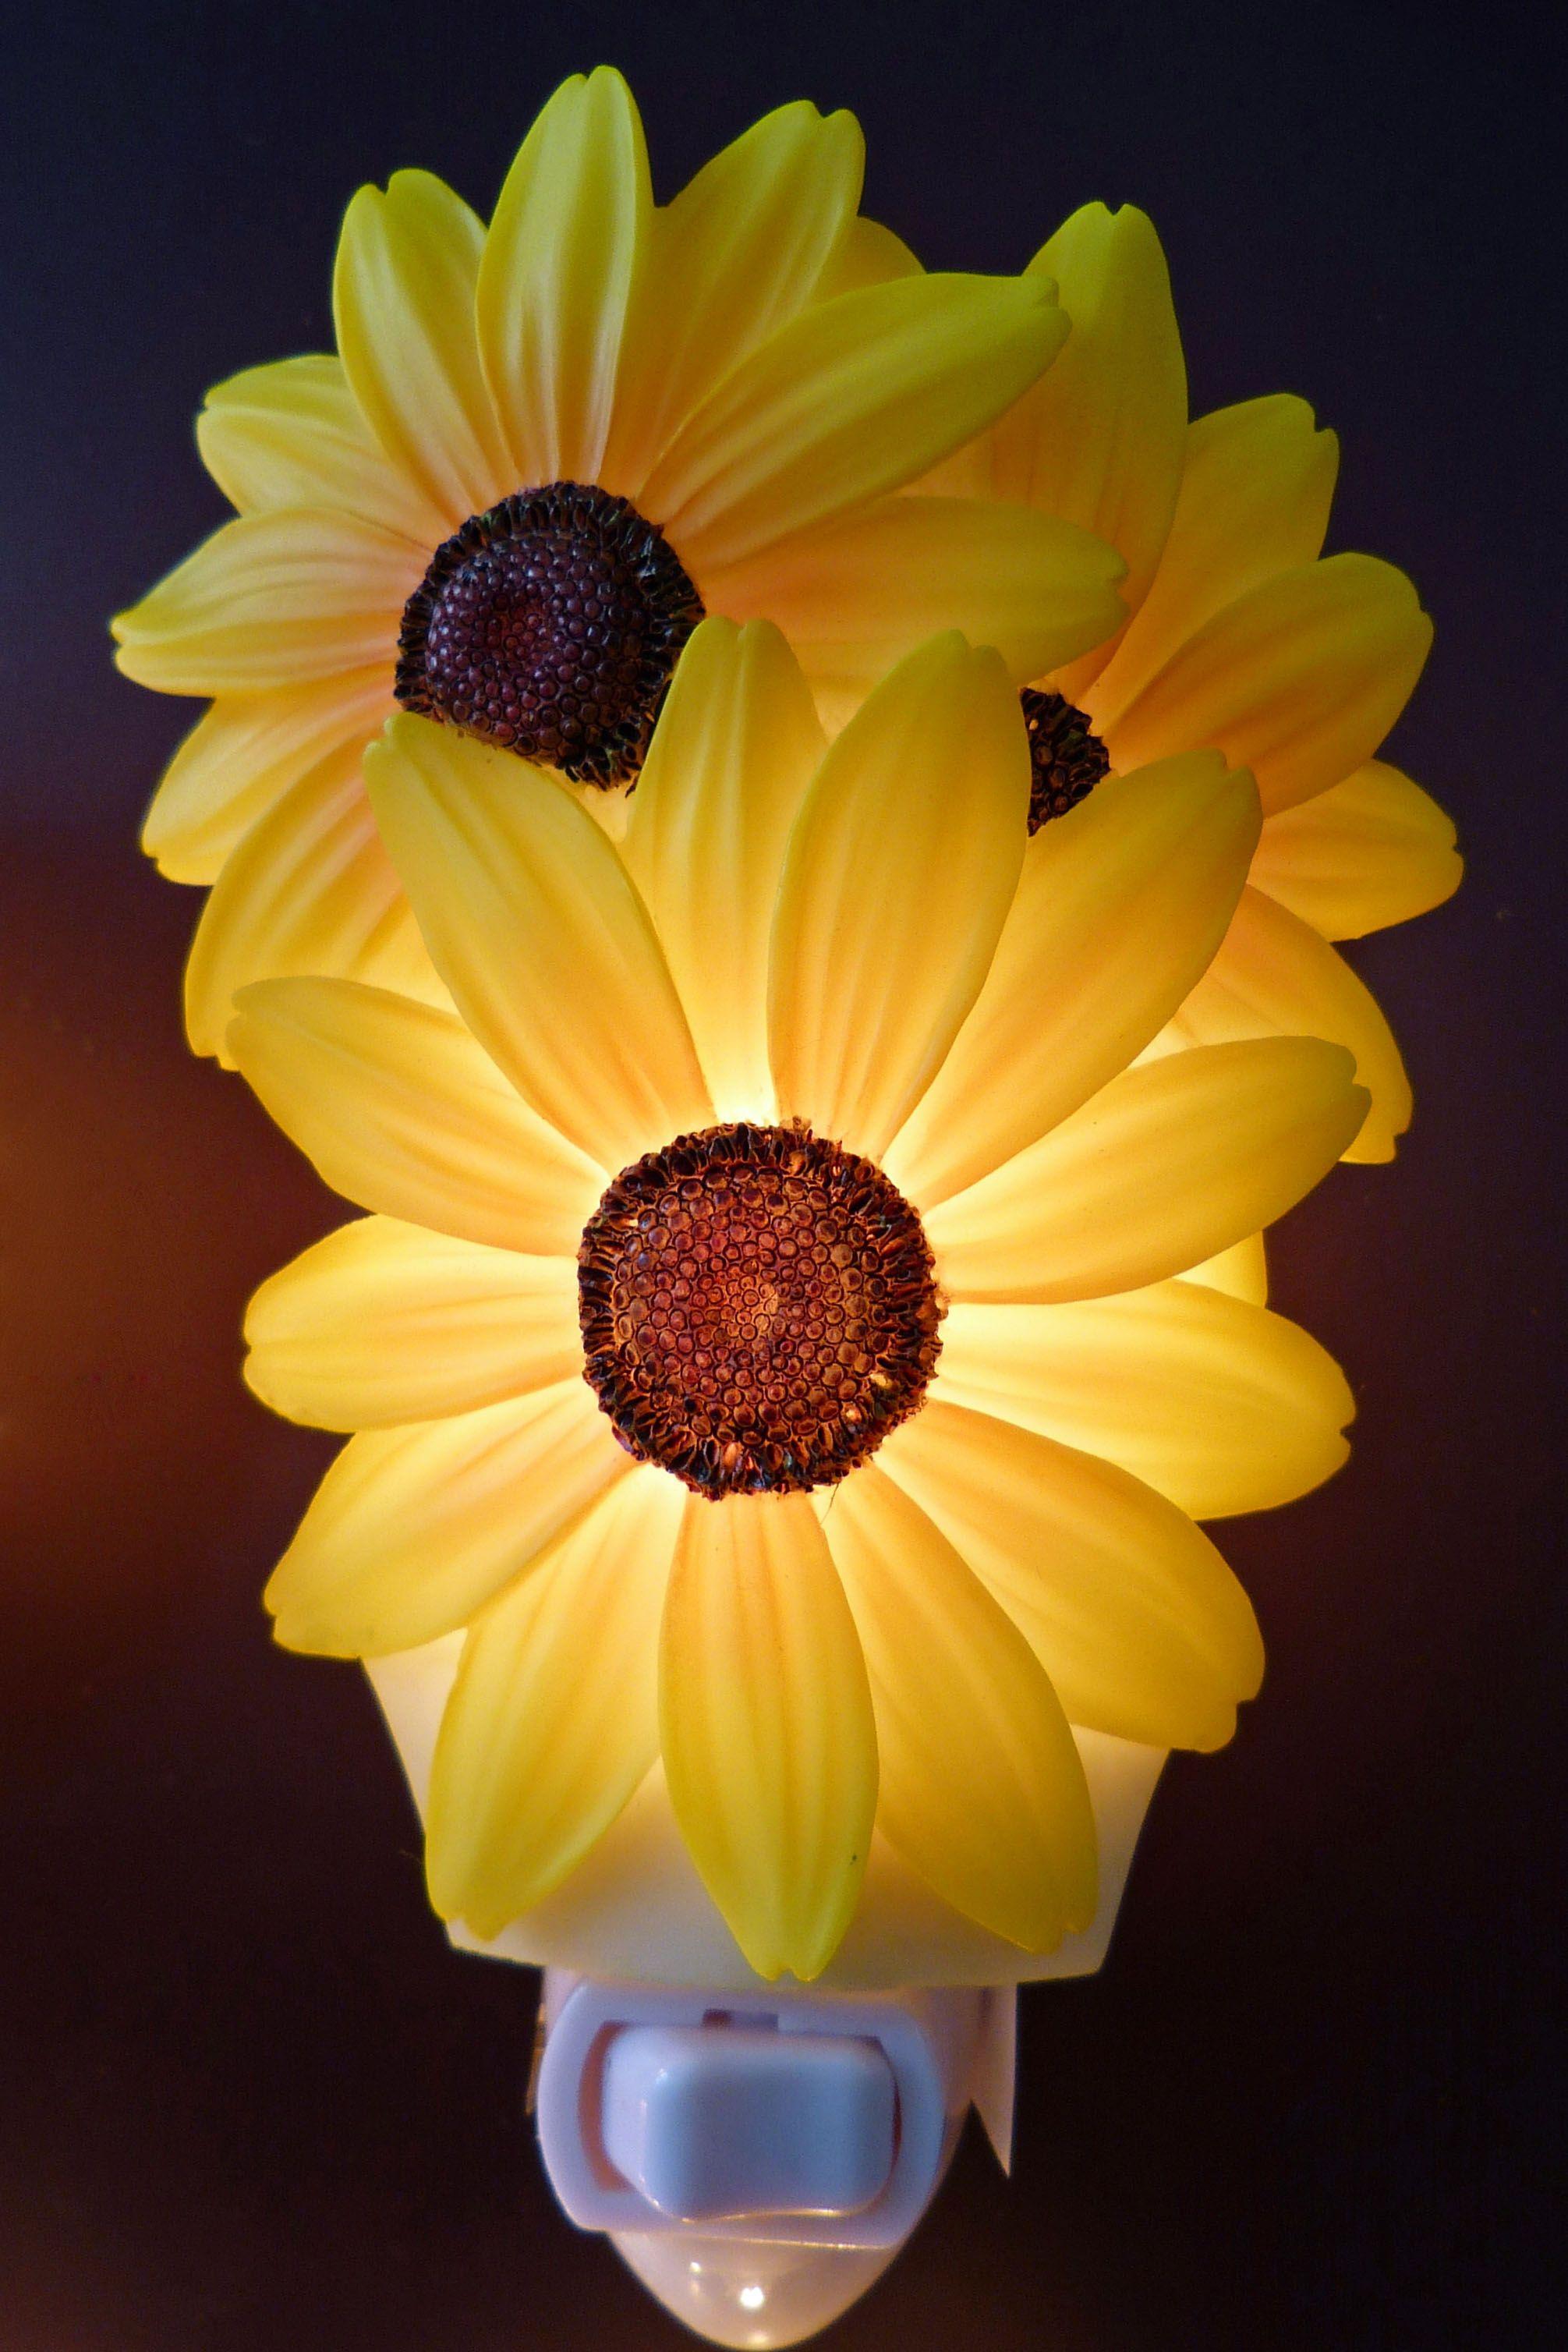 sunflower night light | SUNFLOWERS | Pinterest | Sonnenblumen